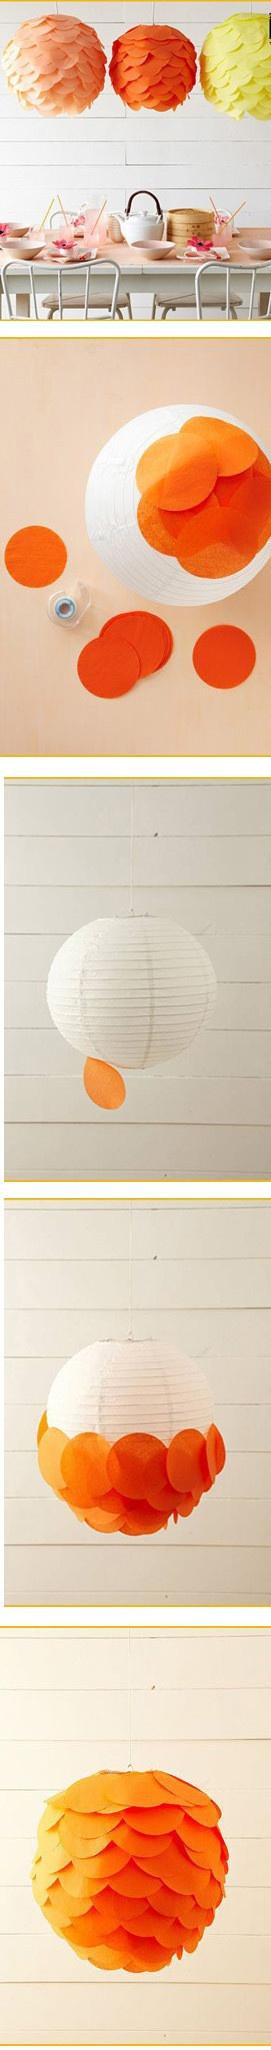 paper_lanterns.jpg